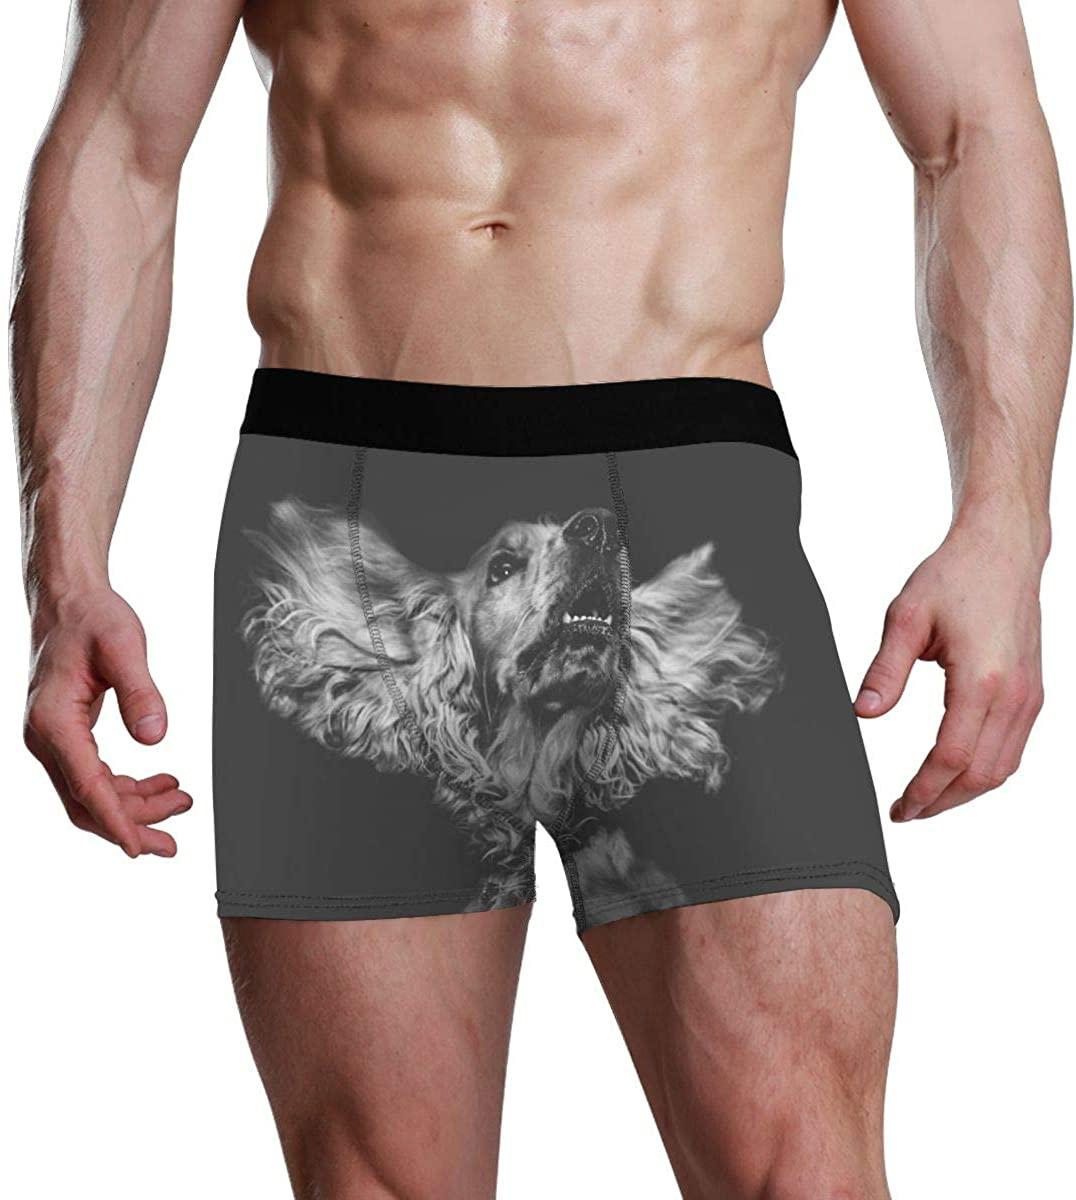 Icybanana Men's Boxer Briefs Dog Pet Animal Pattern Black Soft Cotton Stretch Sports Underwear Japanese